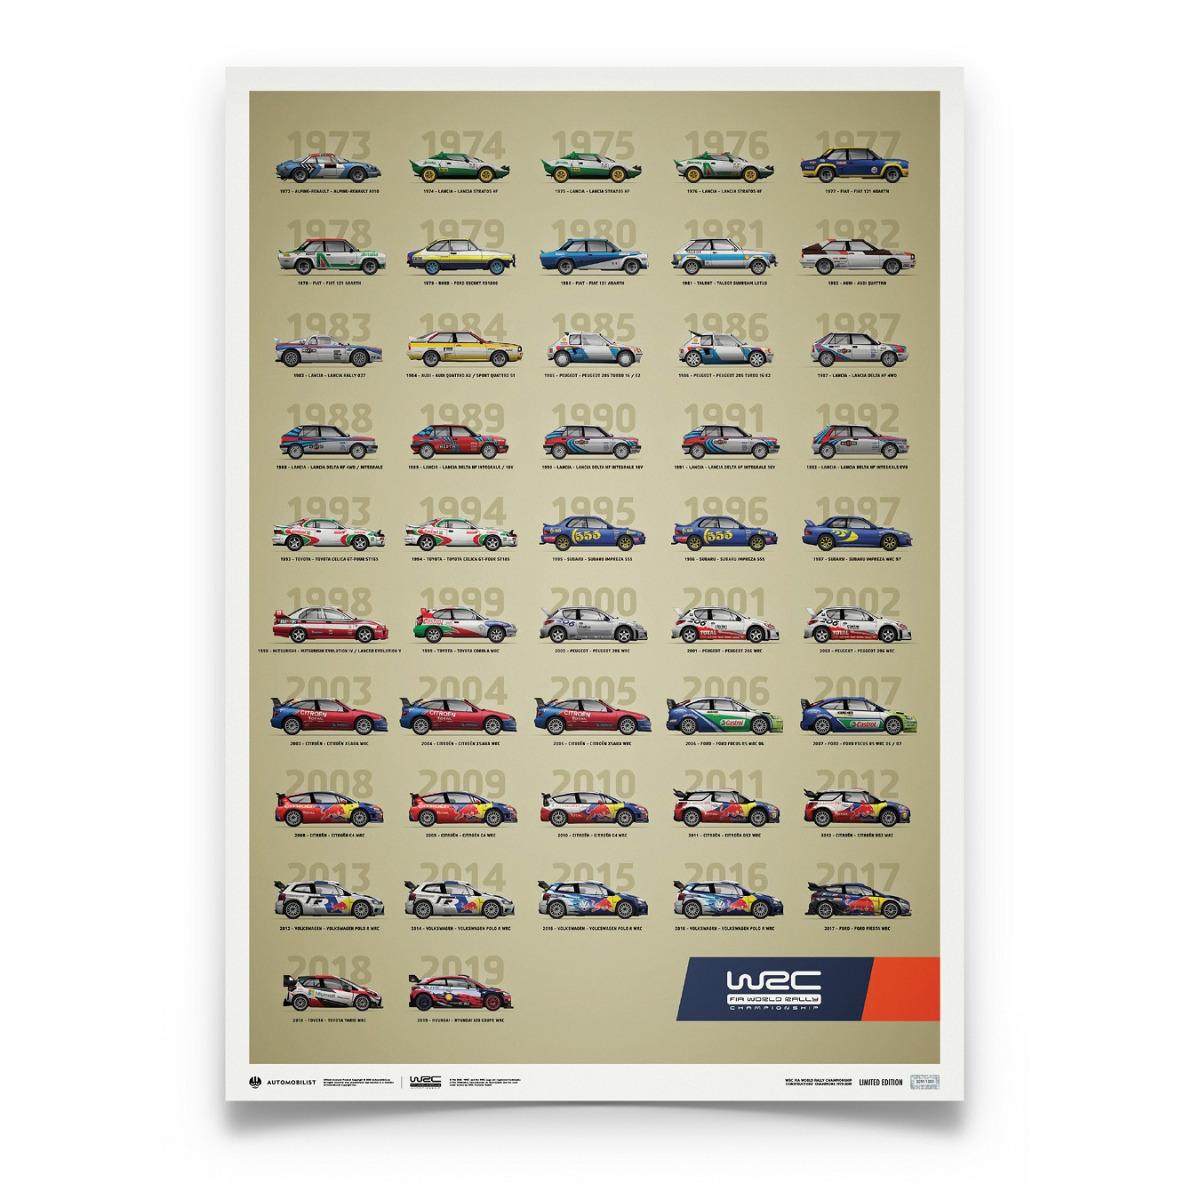 WRC Constructors' Champions 1973-2019 - 47th Anniversary